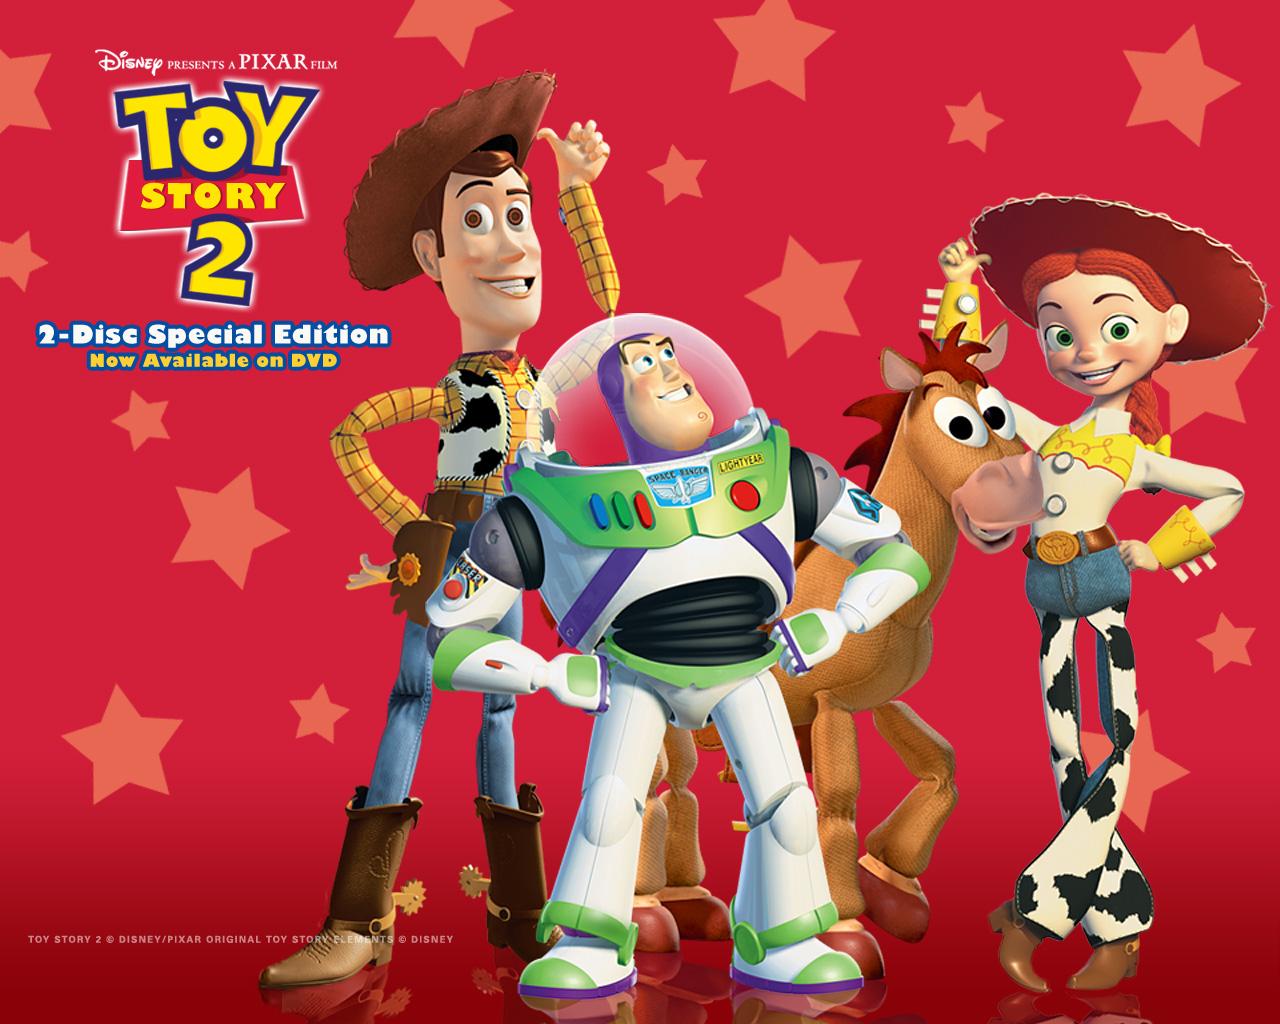 Toy story woody wallpaper wallpapersafari - Toy story wallpaper ...